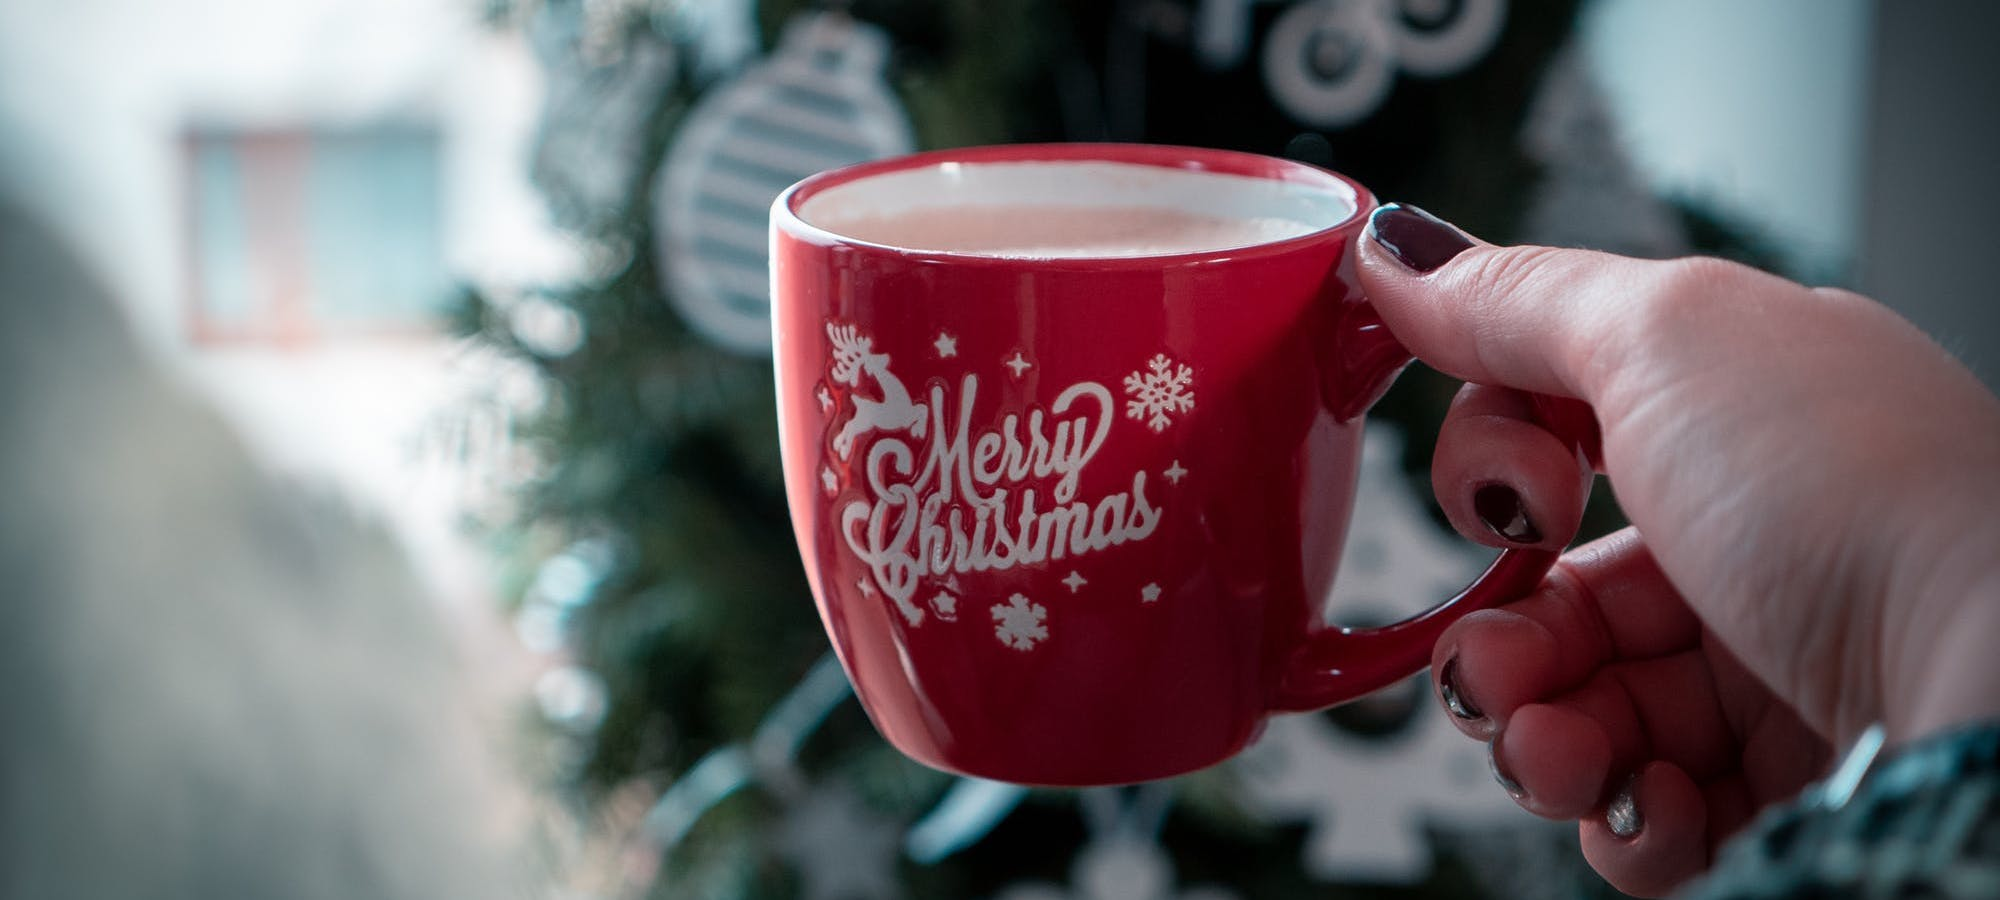 Christmas Coffee Gift Ideas 2019